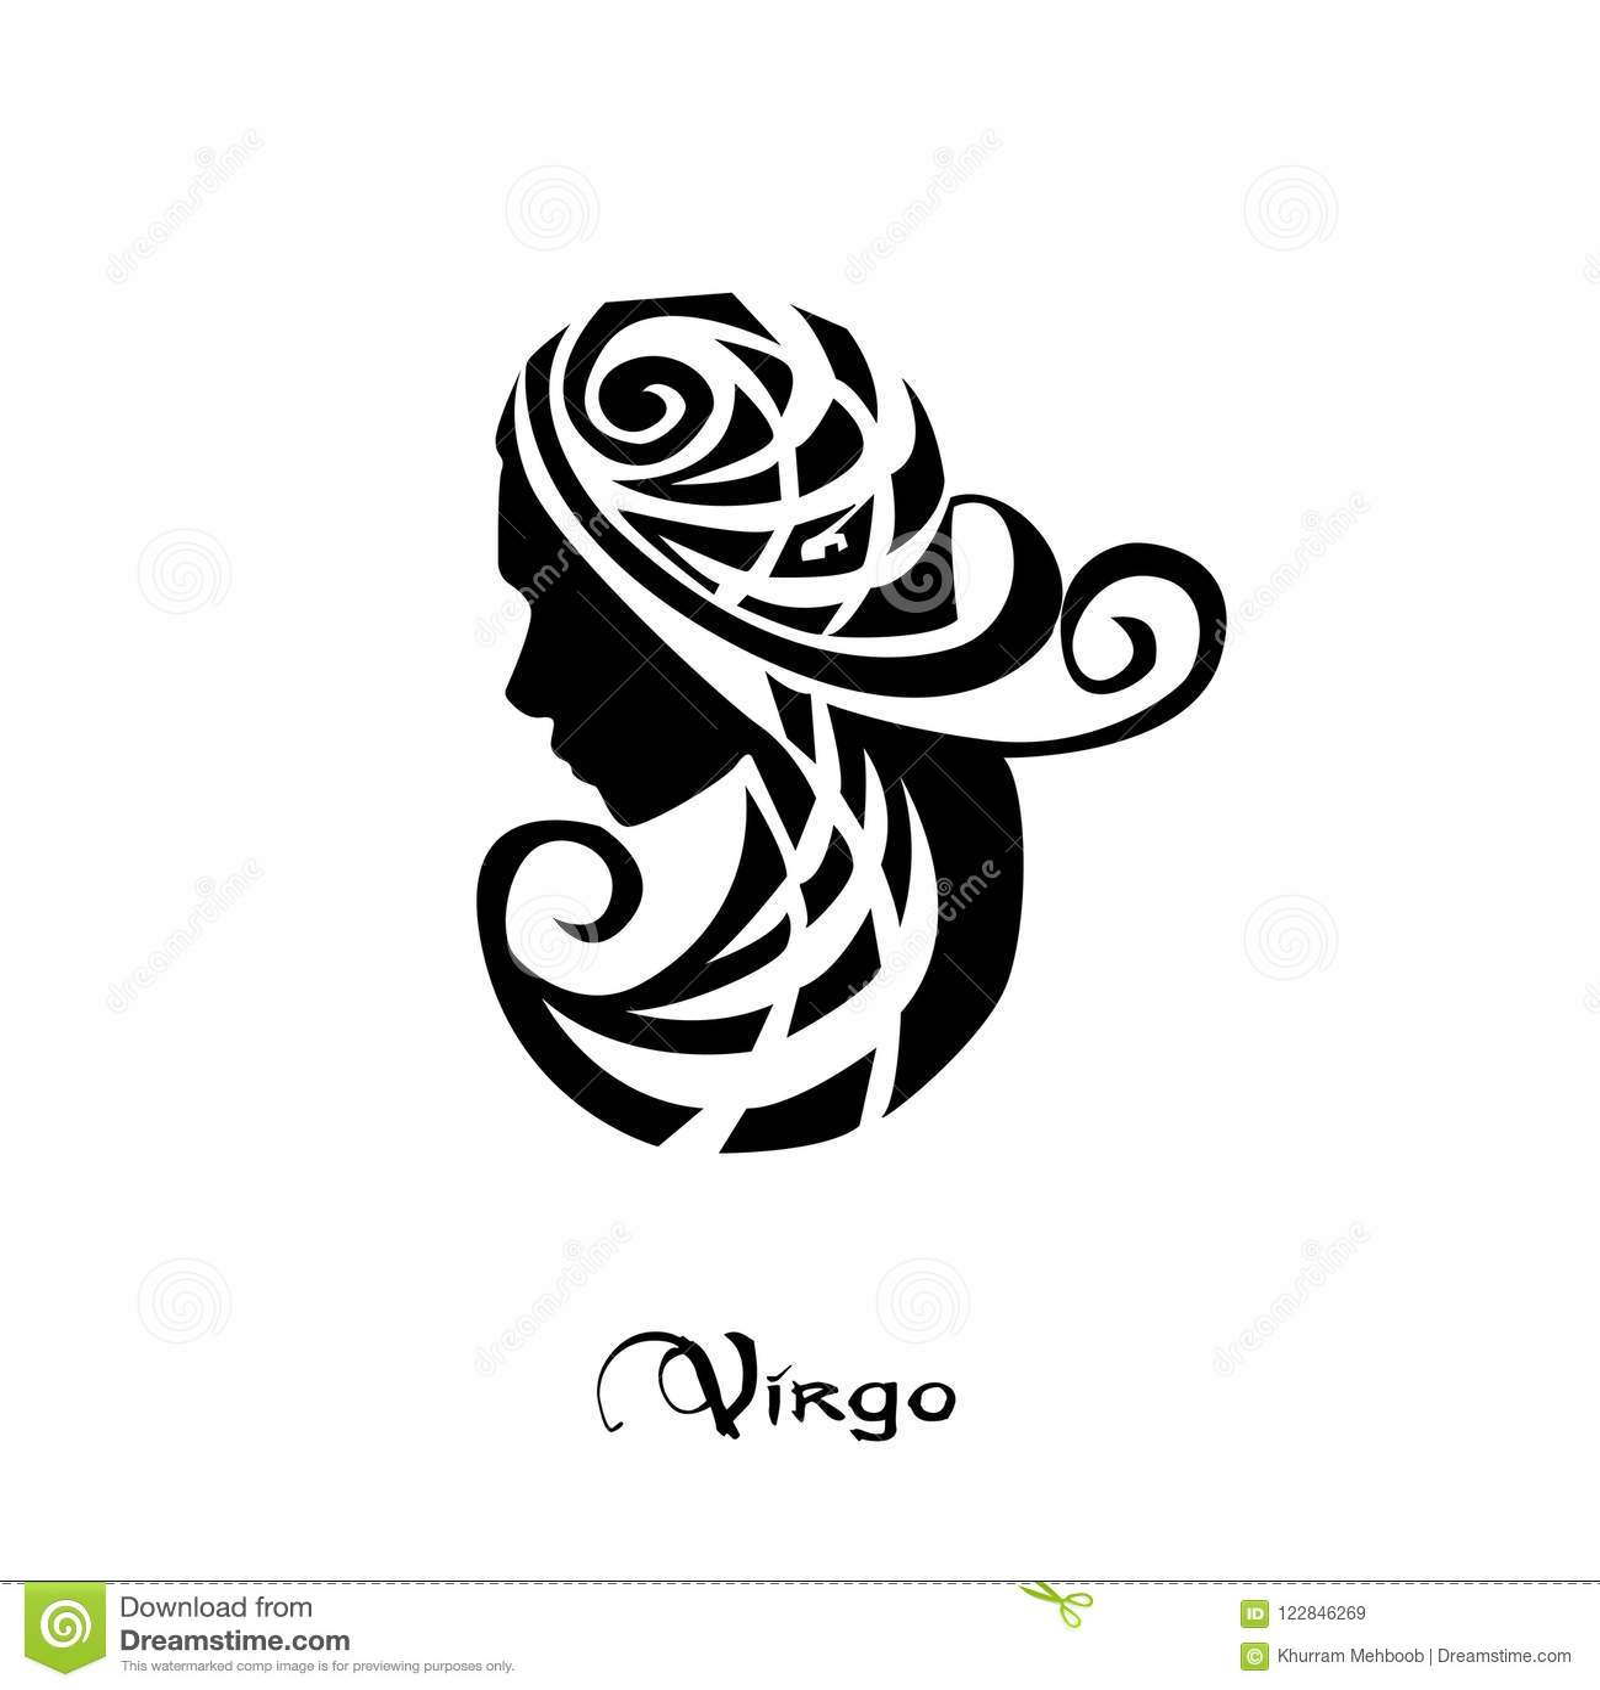 faea0a5d9159e Virgo Zodiac Sign Tattoo Style Stock Vector - Illustration of aries ...